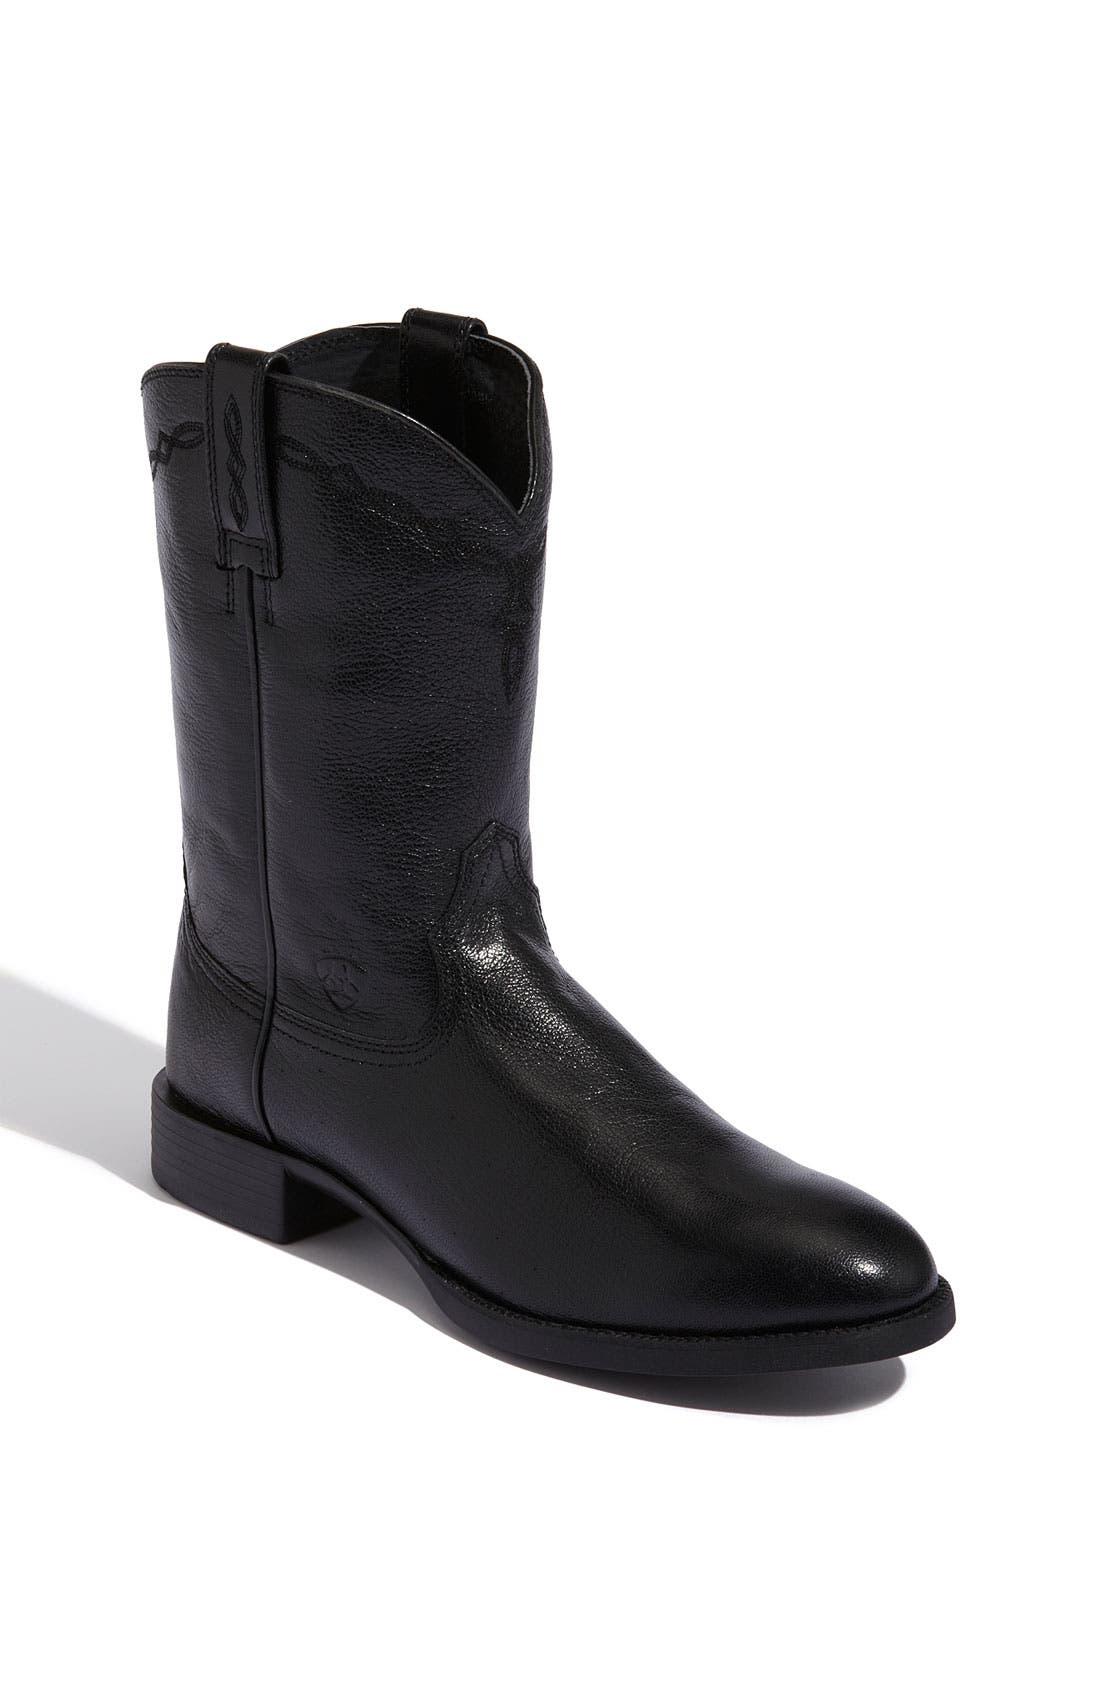 Alternate Image 1 Selected - Ariat 'Heritage Roper' Boot (Online Only) (Men)